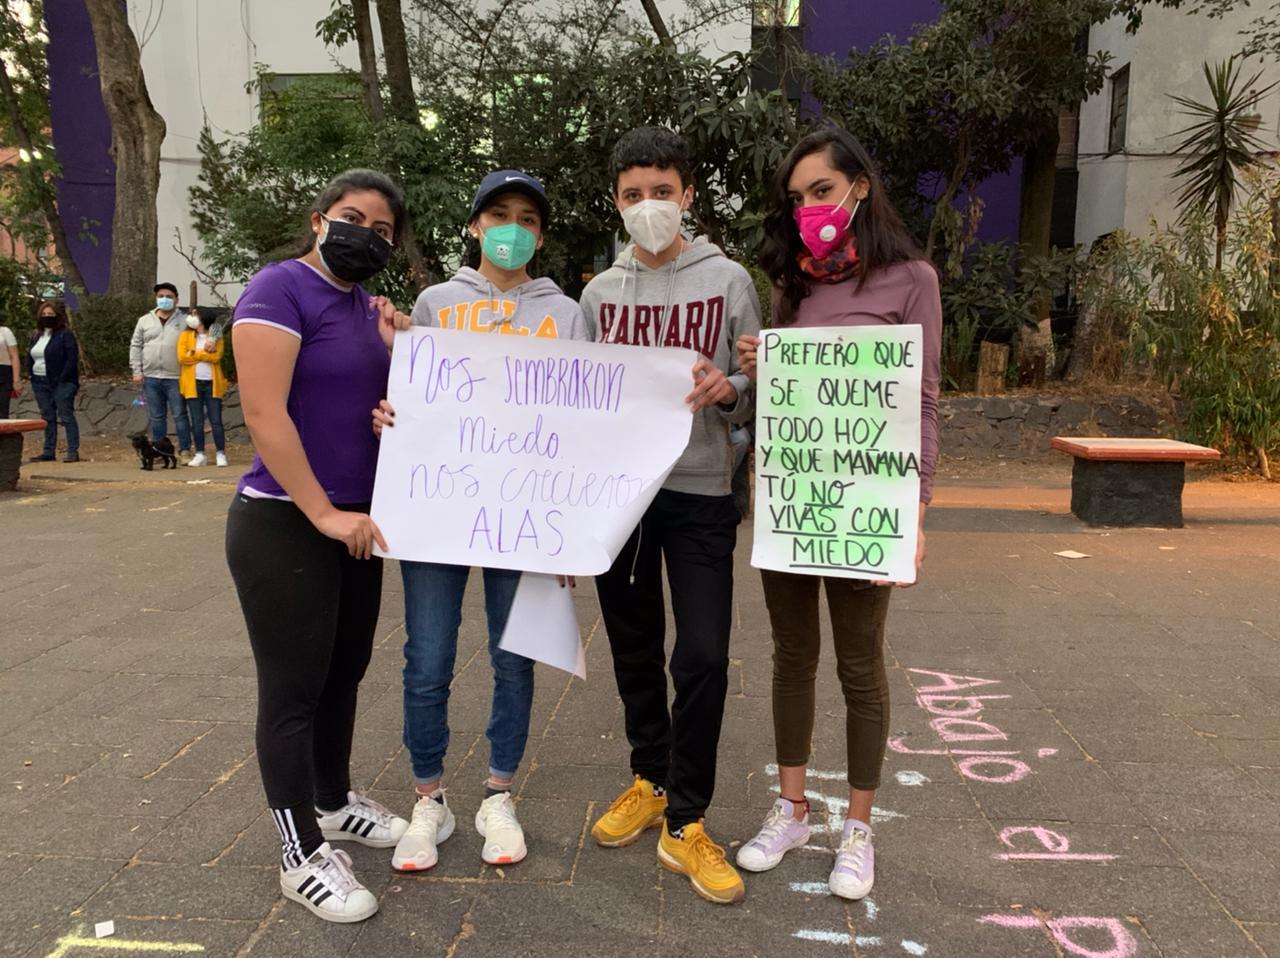 marcha de mujeres alvaro obregon cdmx